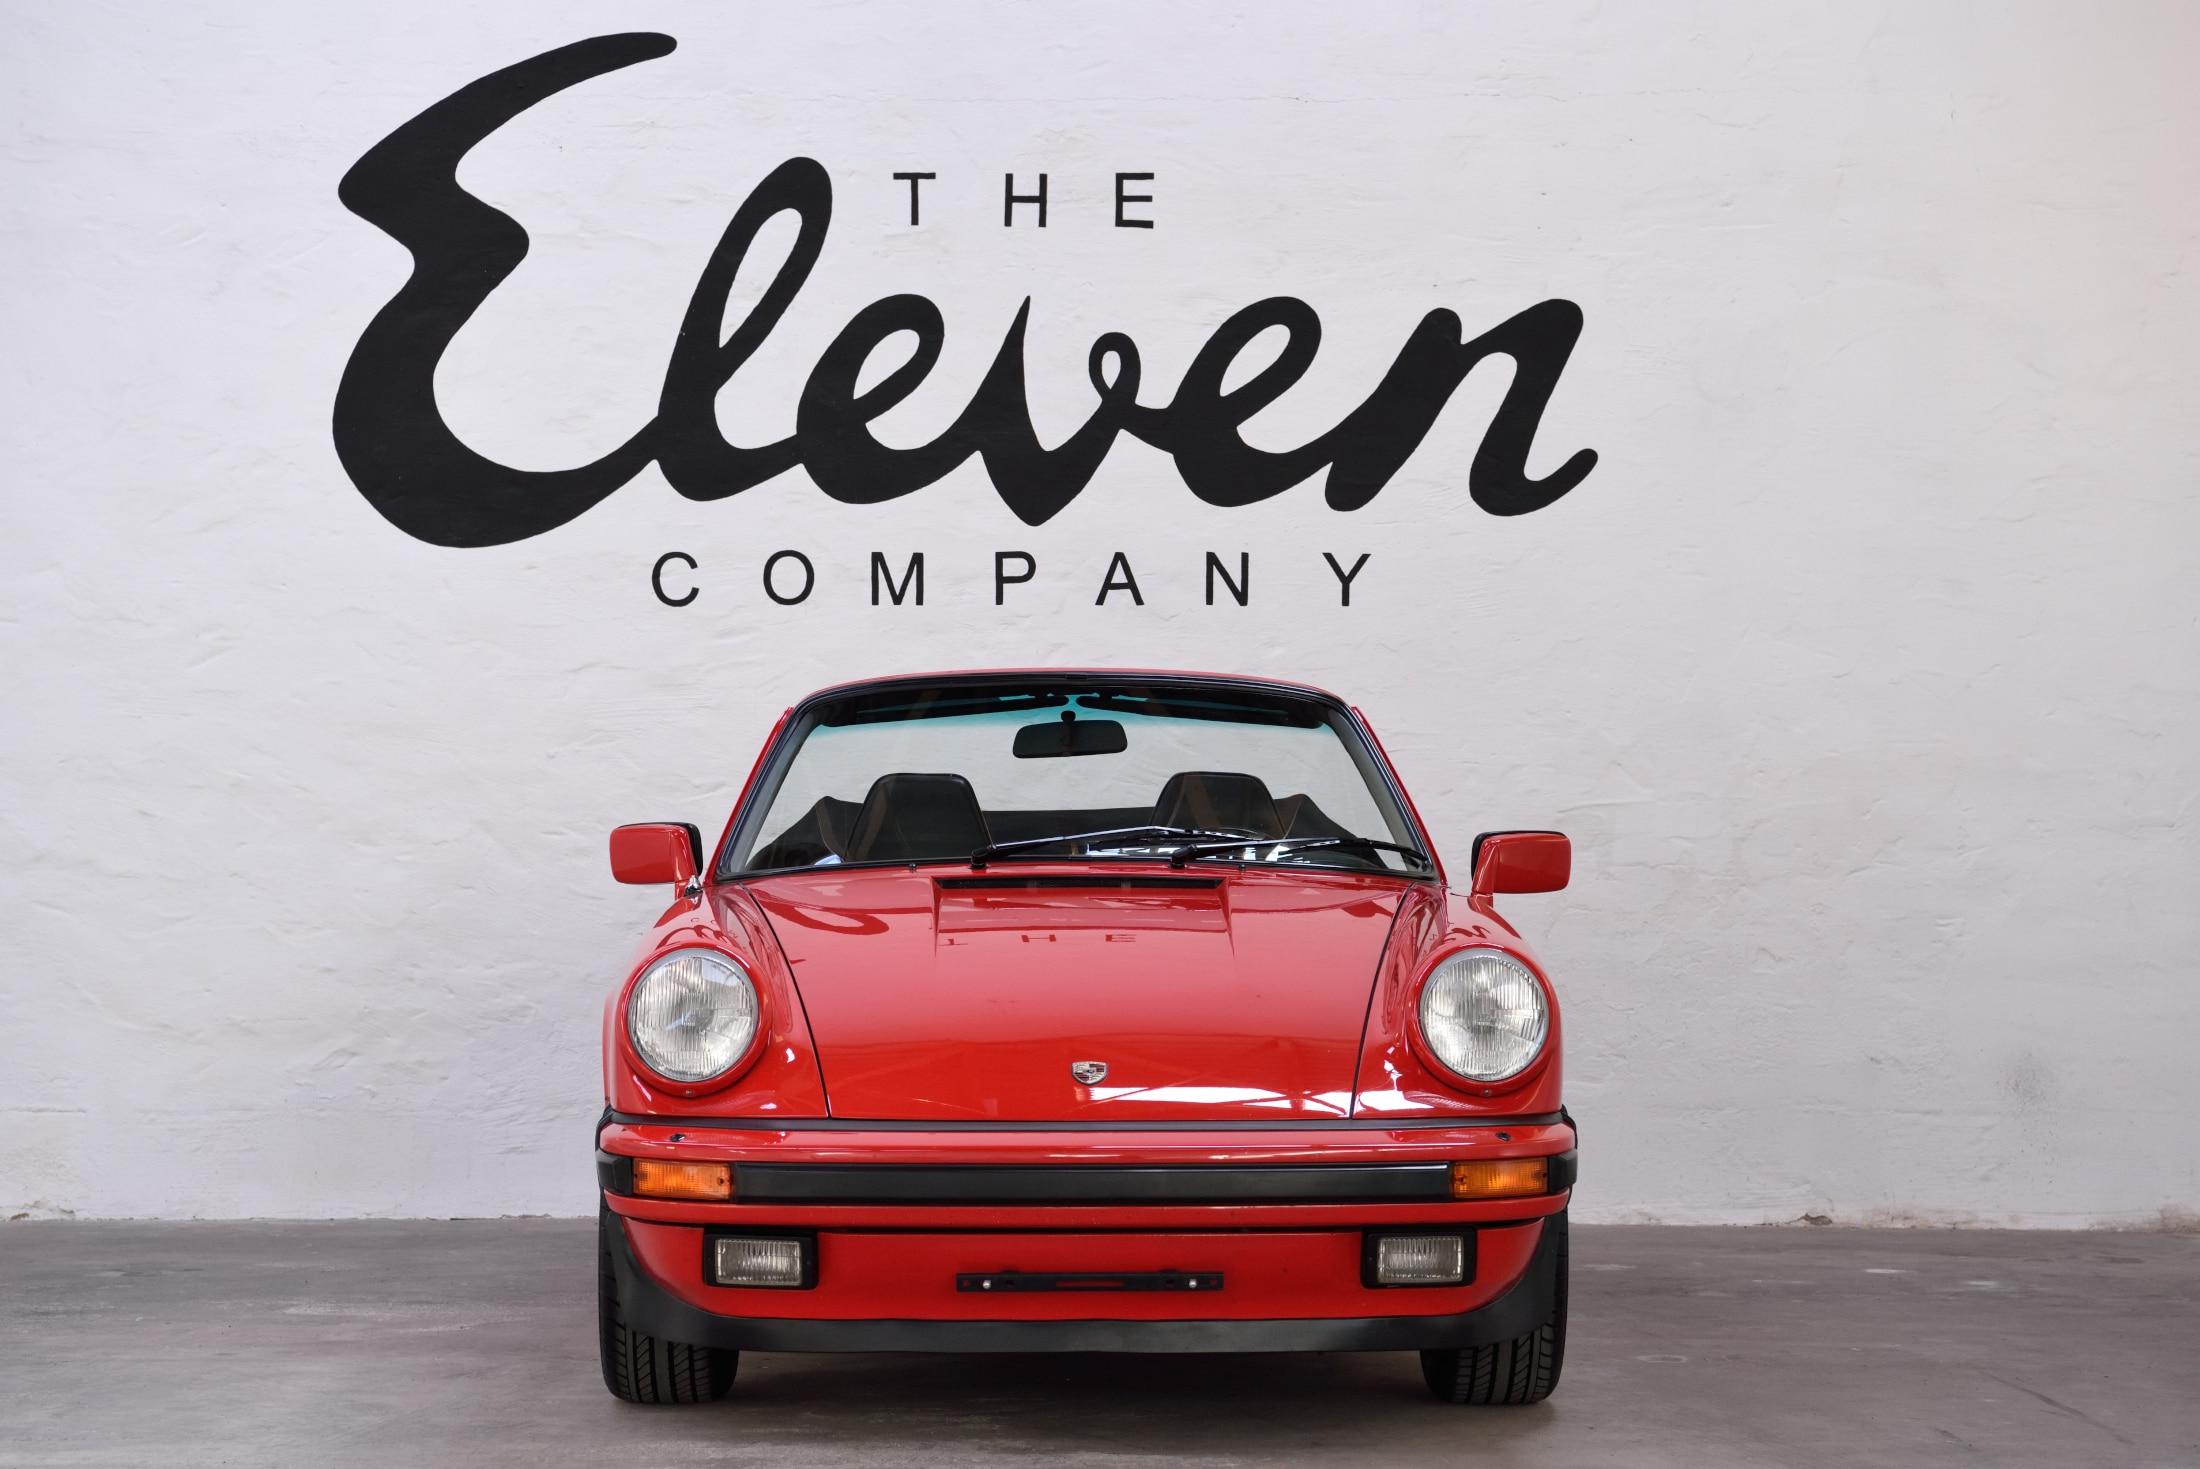 Porsche 911 Carrer Cabriolet